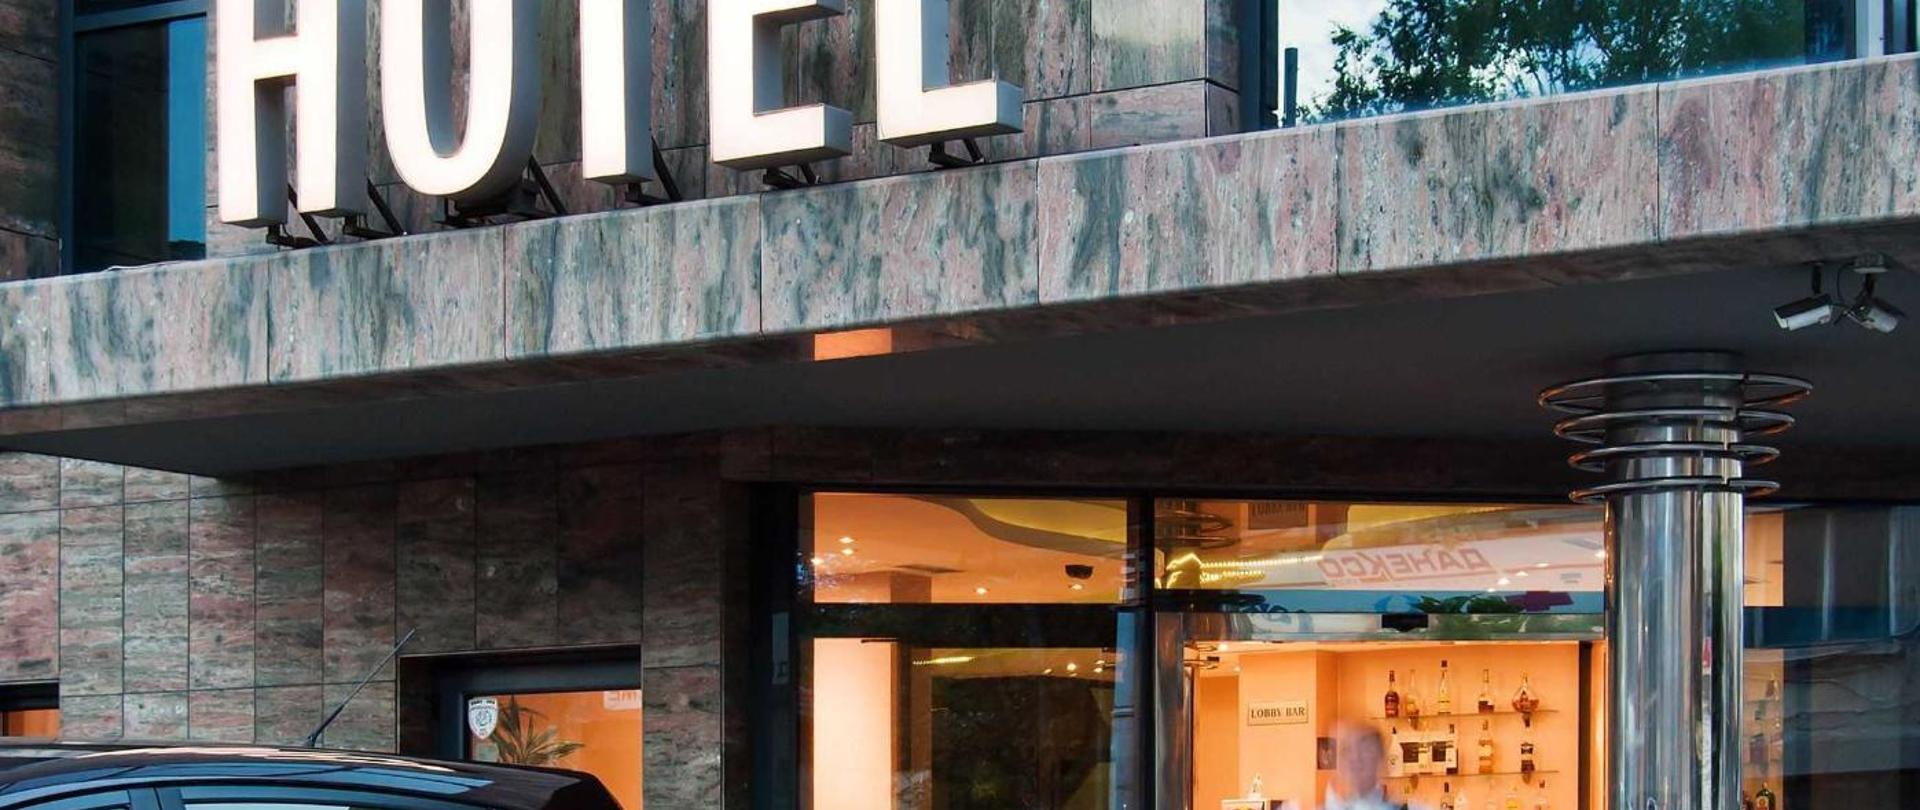 hotel_entrance_with_shuttle_car.jpg